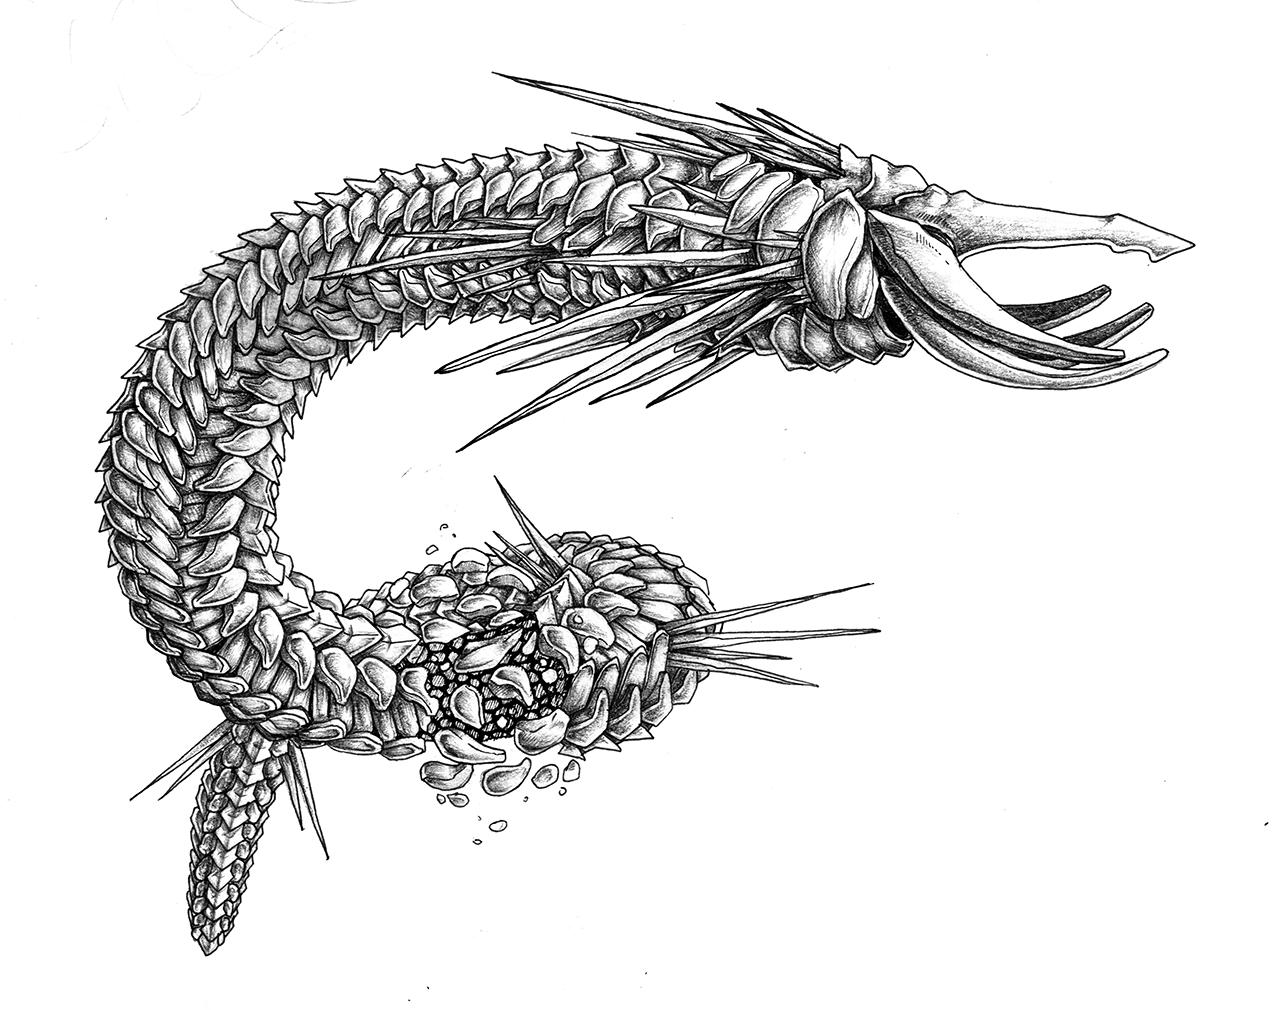 Alien Worm Concept